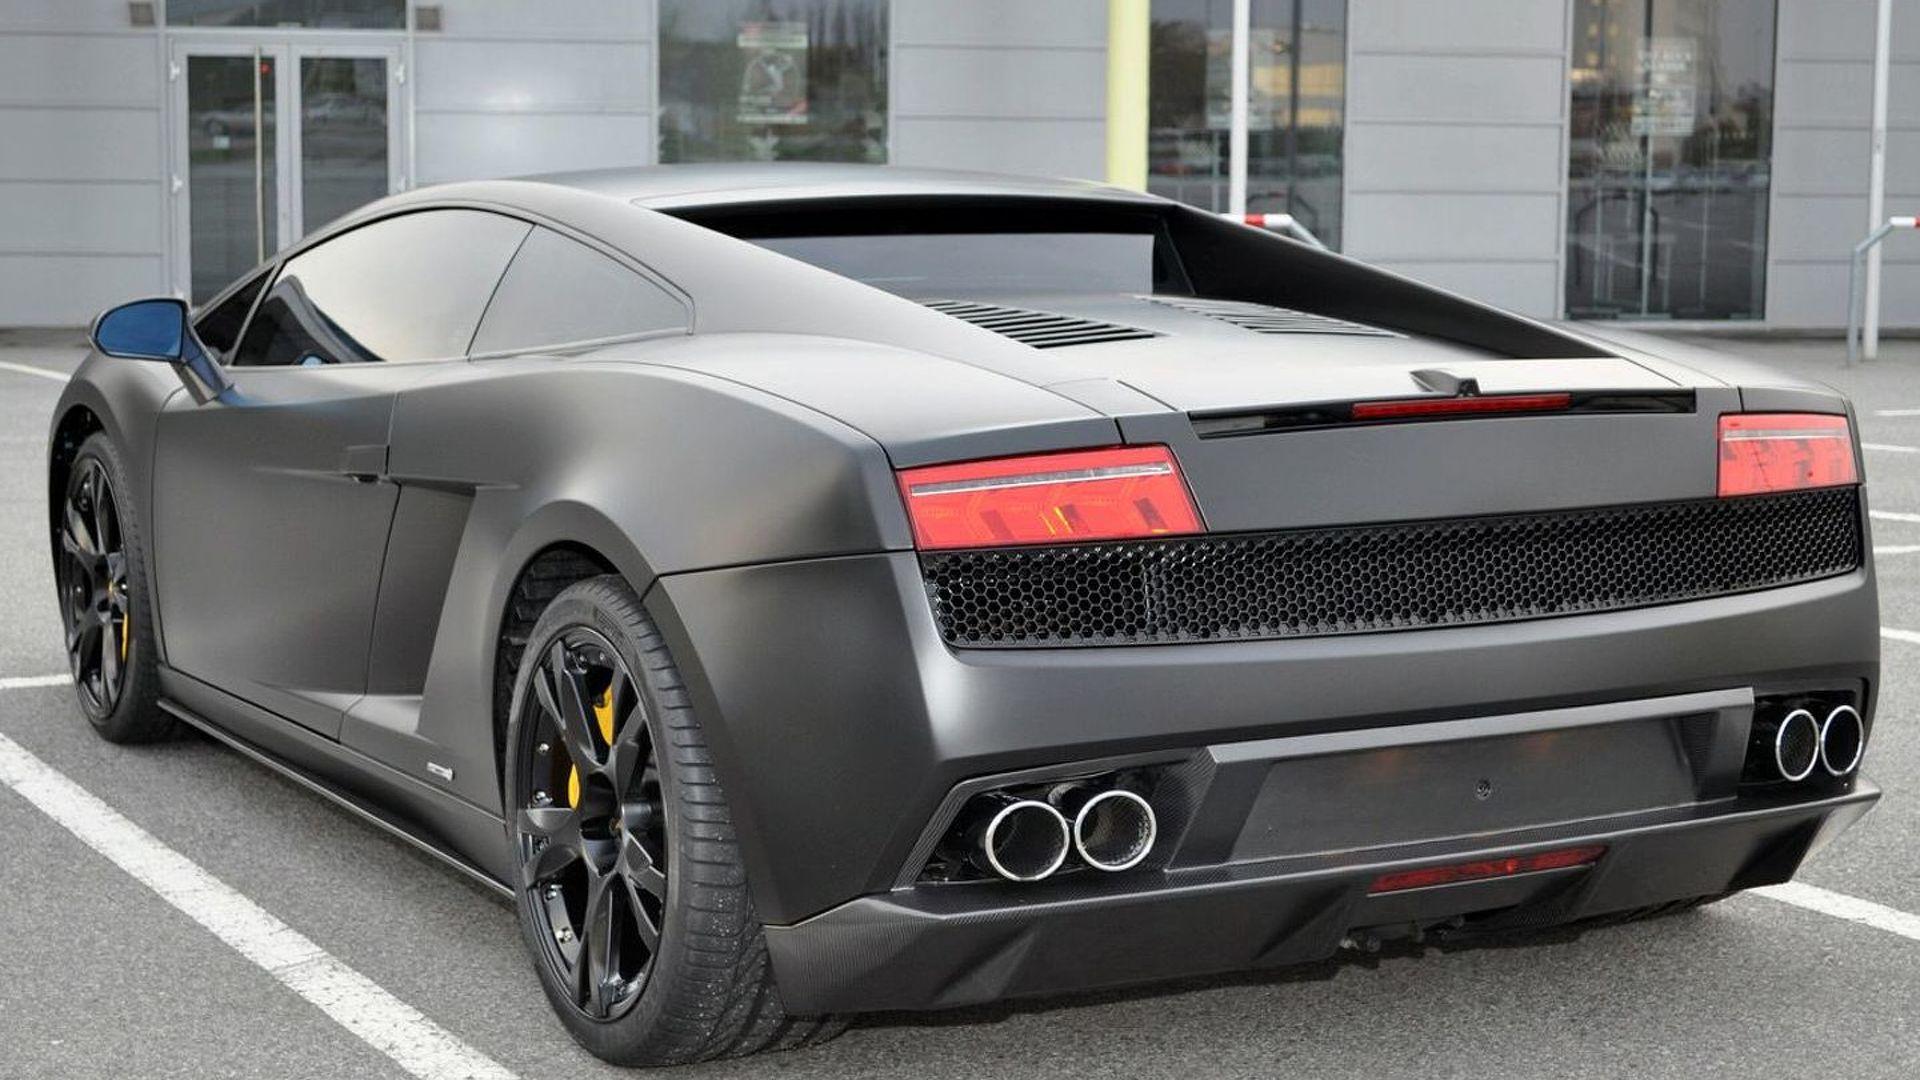 Lamborghini Gallardo LP 560-4 by ENCO Exclusive